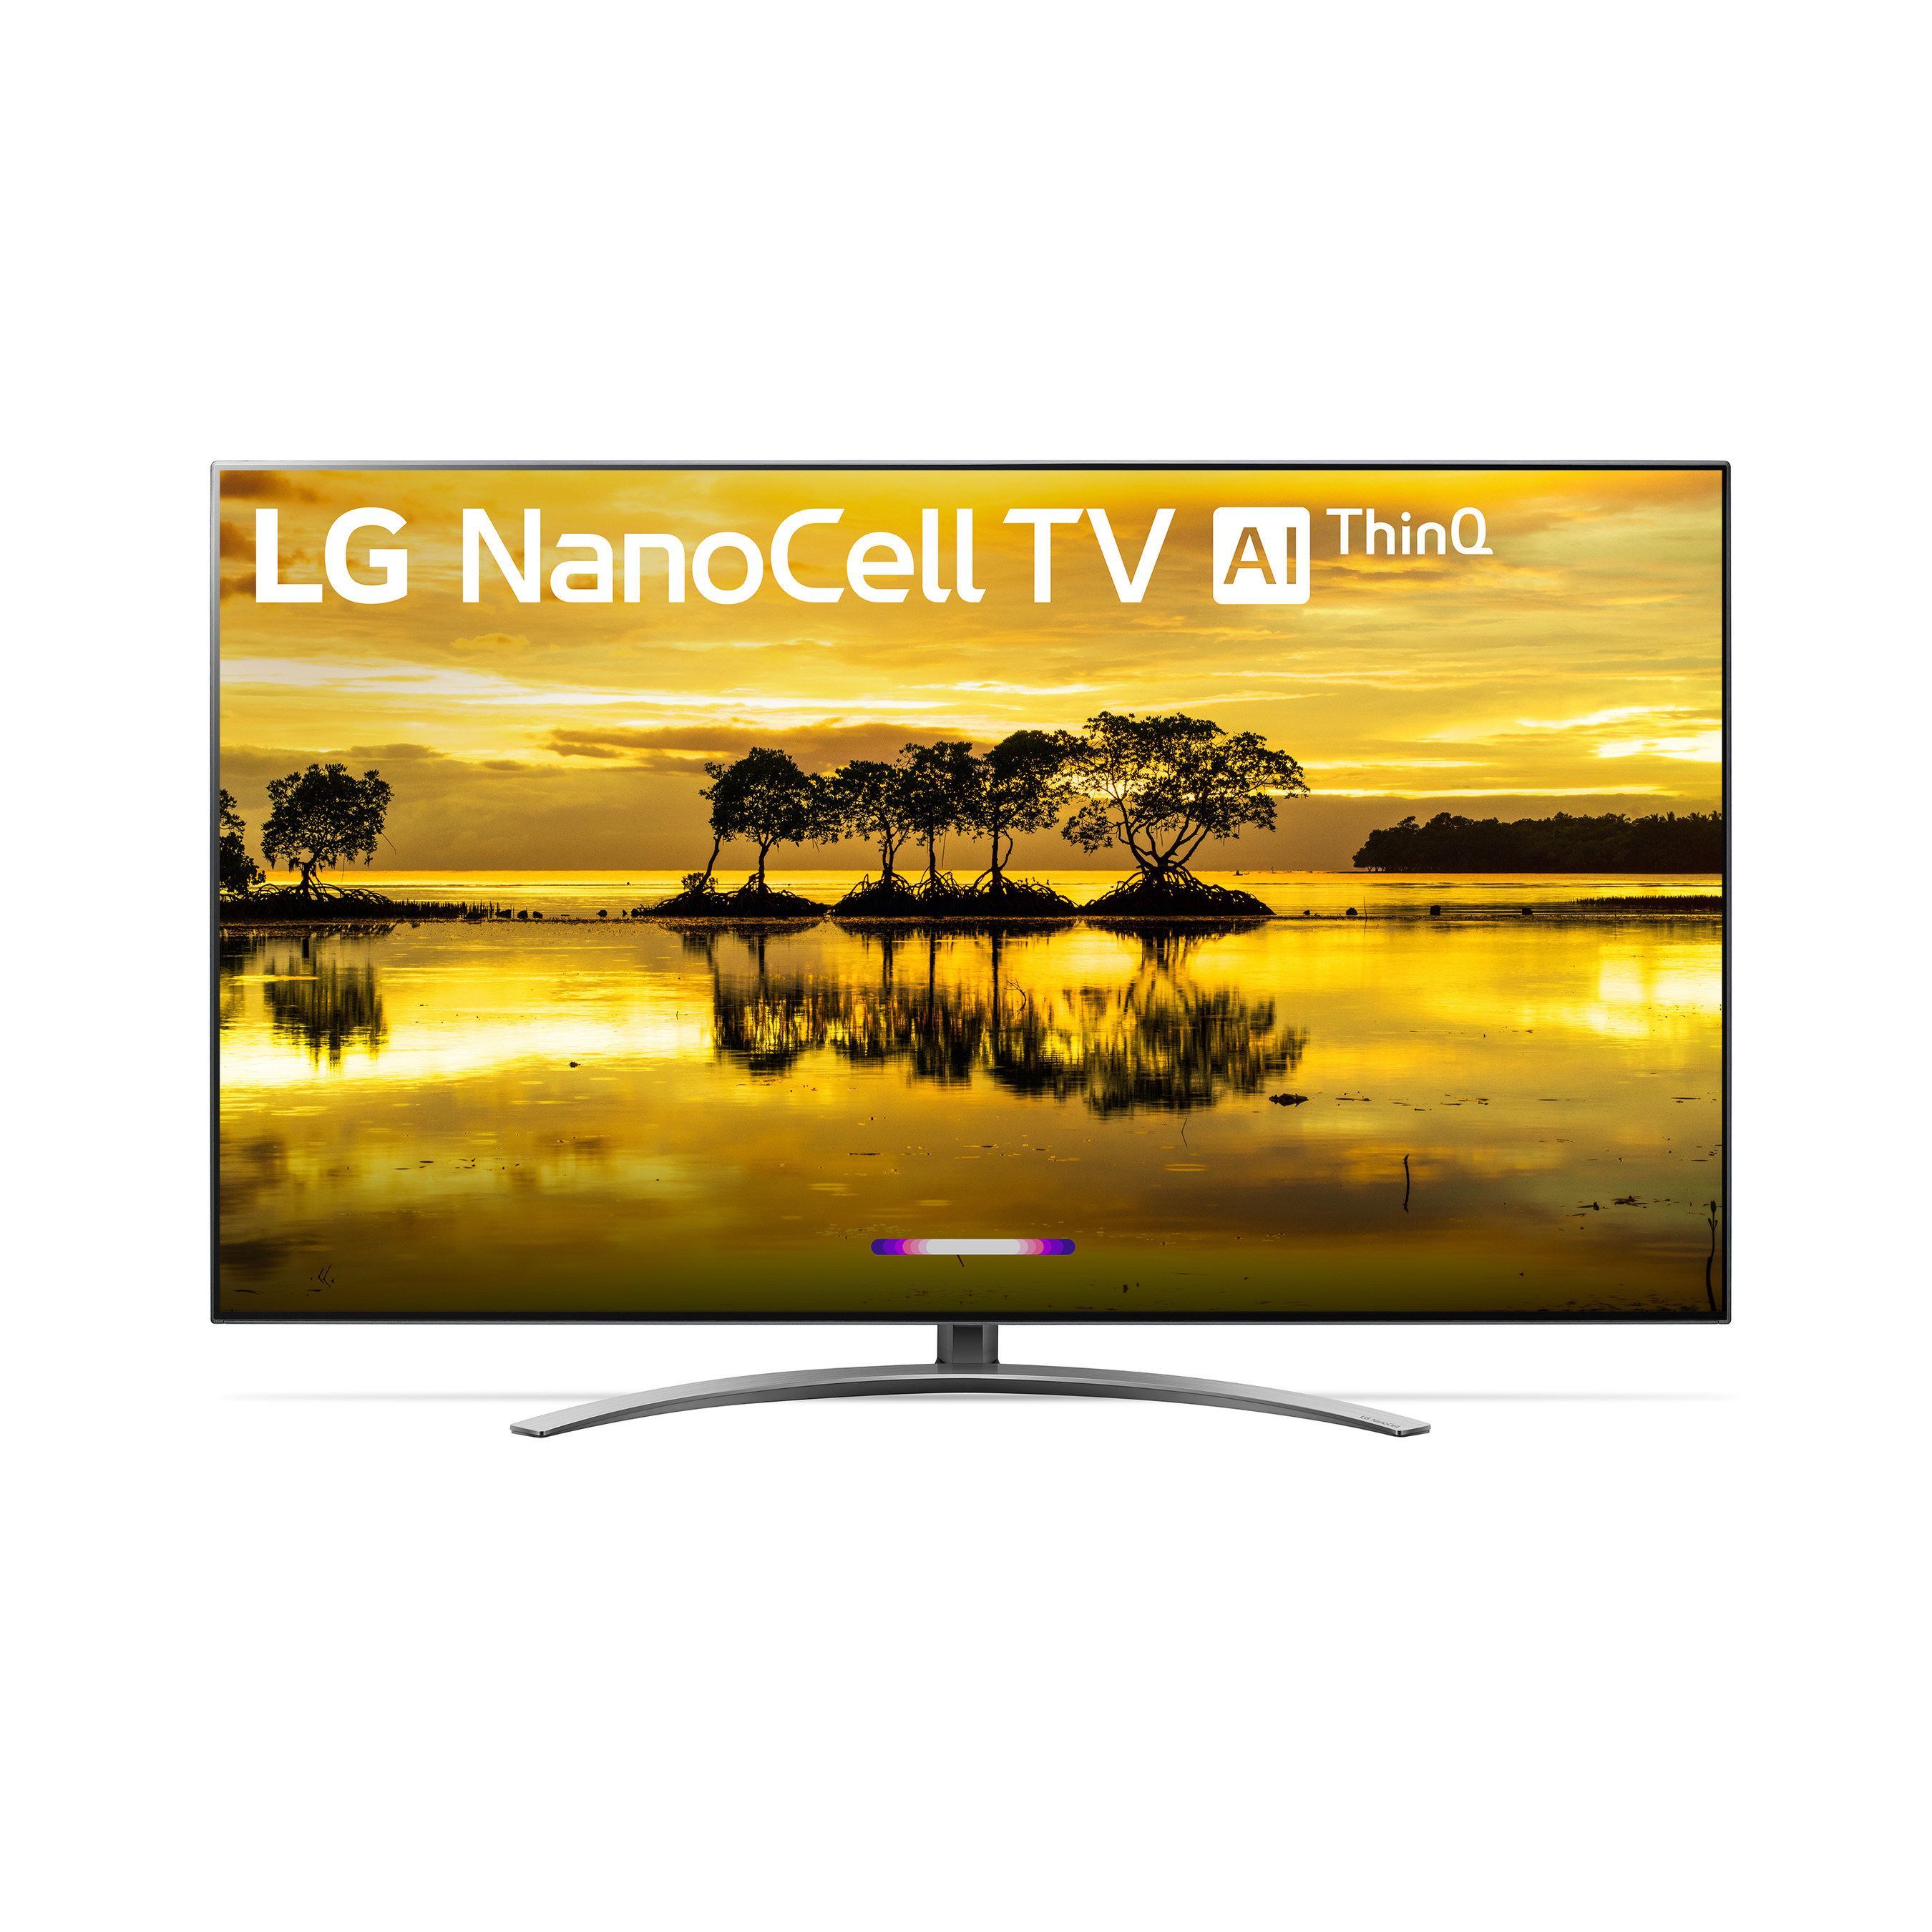 LG USA Launches 2019 LG Nanocell TVs: LG's Most Advanced 4K